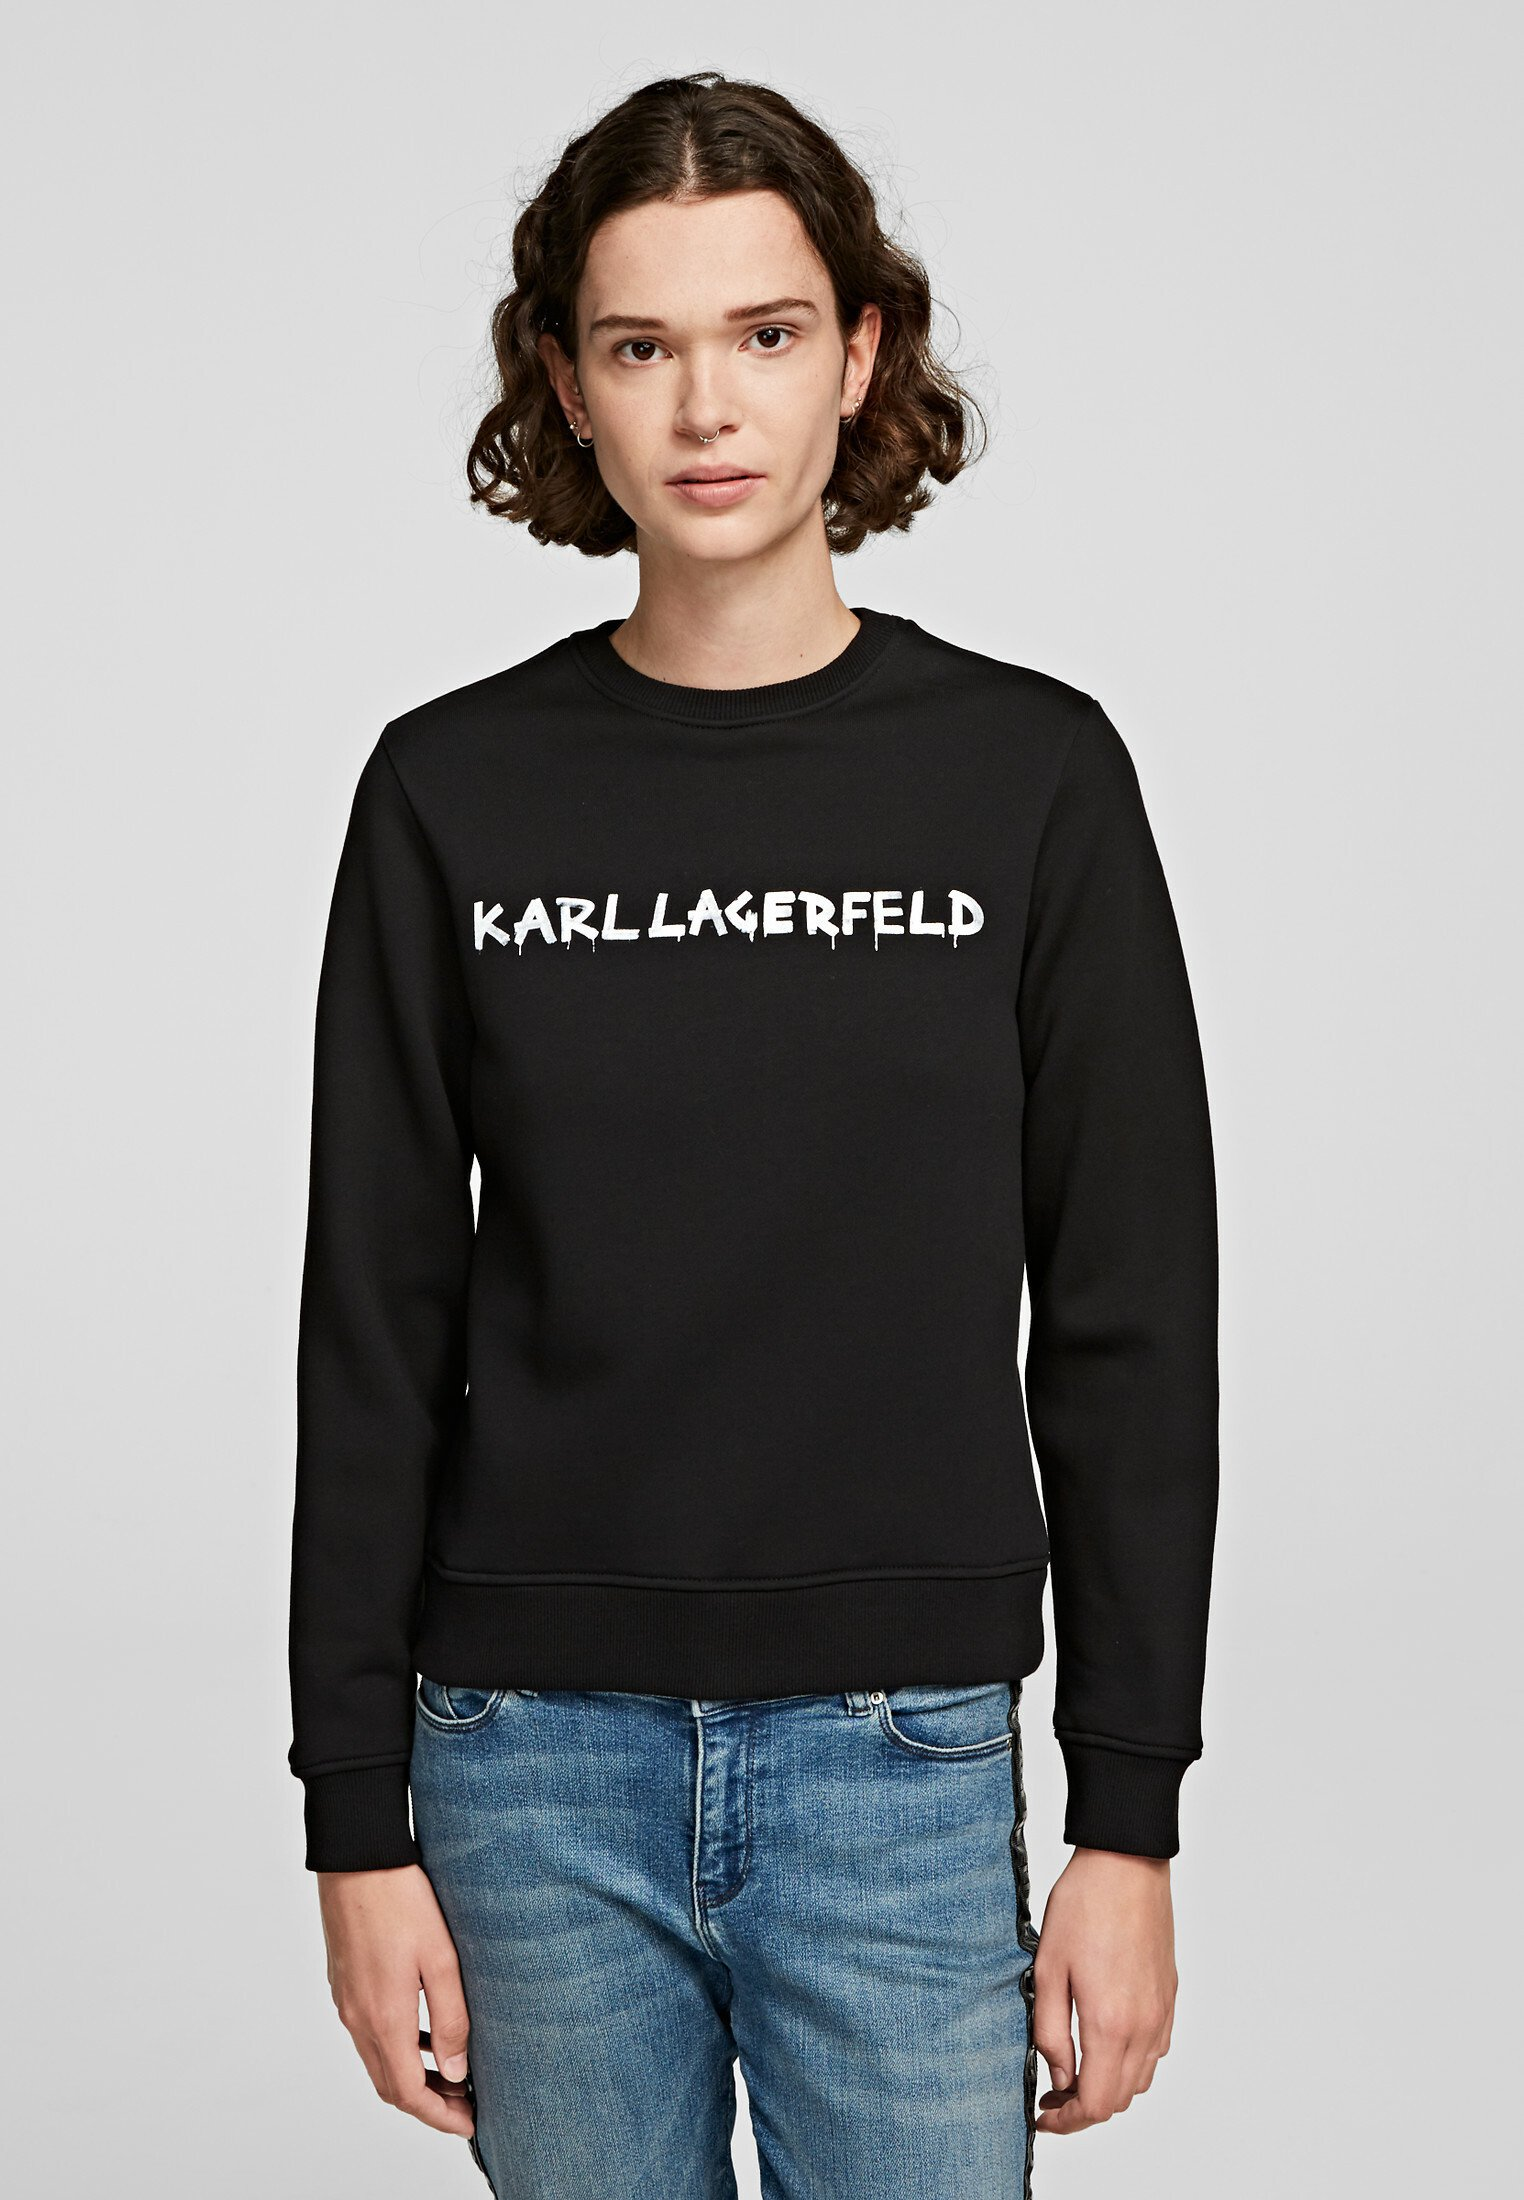 Shopping Women's Clothing KARL LAGERFELD Sweatshirt black e5LNEK4YM